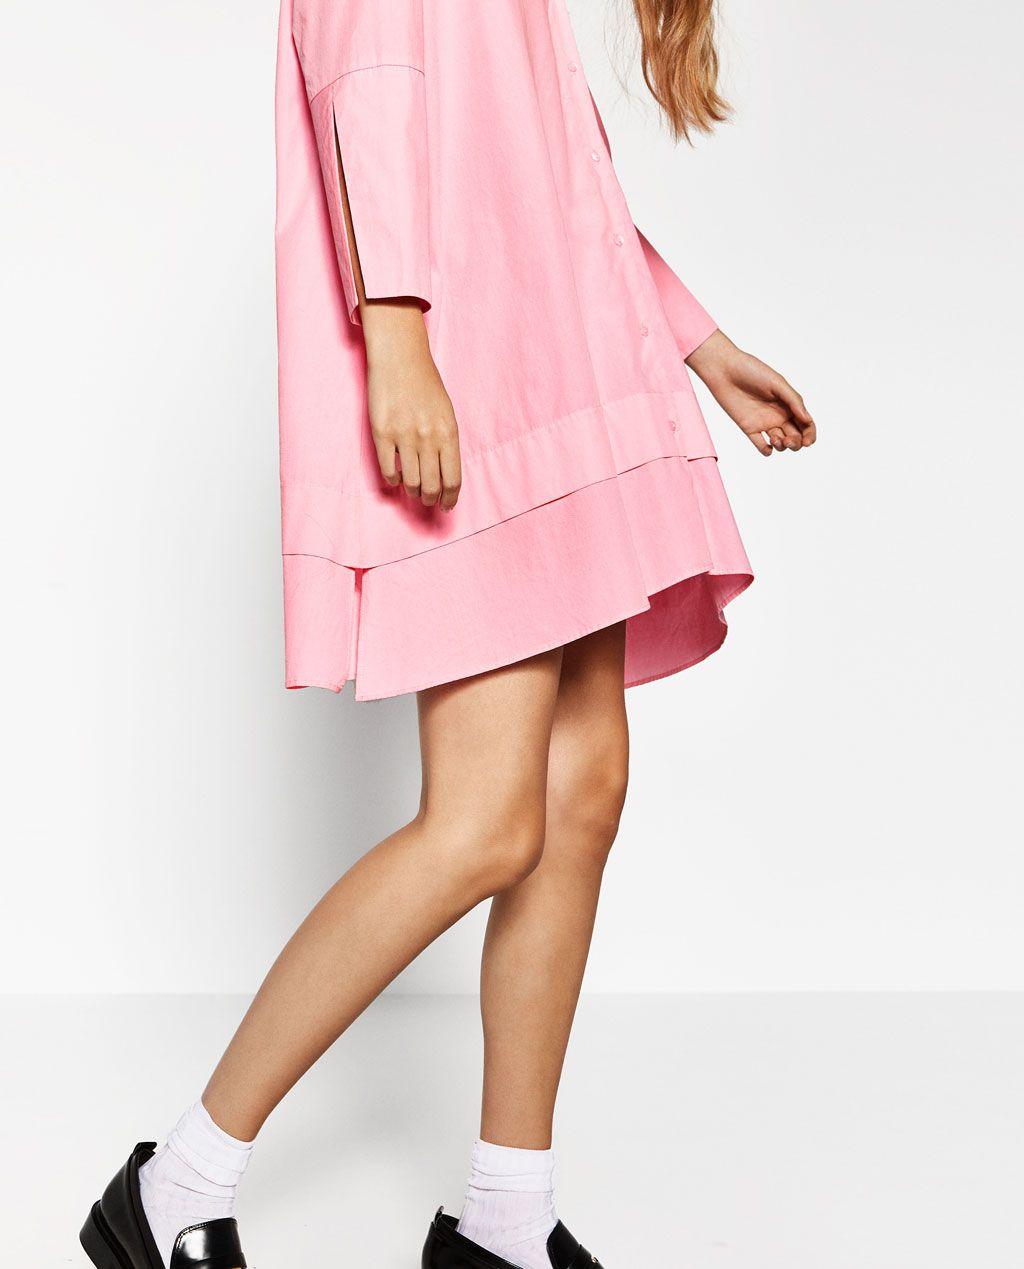 Shirt dress dresses woman sale zara indonesia styling shirt dress dresses woman sale zara indonesia stopboris Choice Image